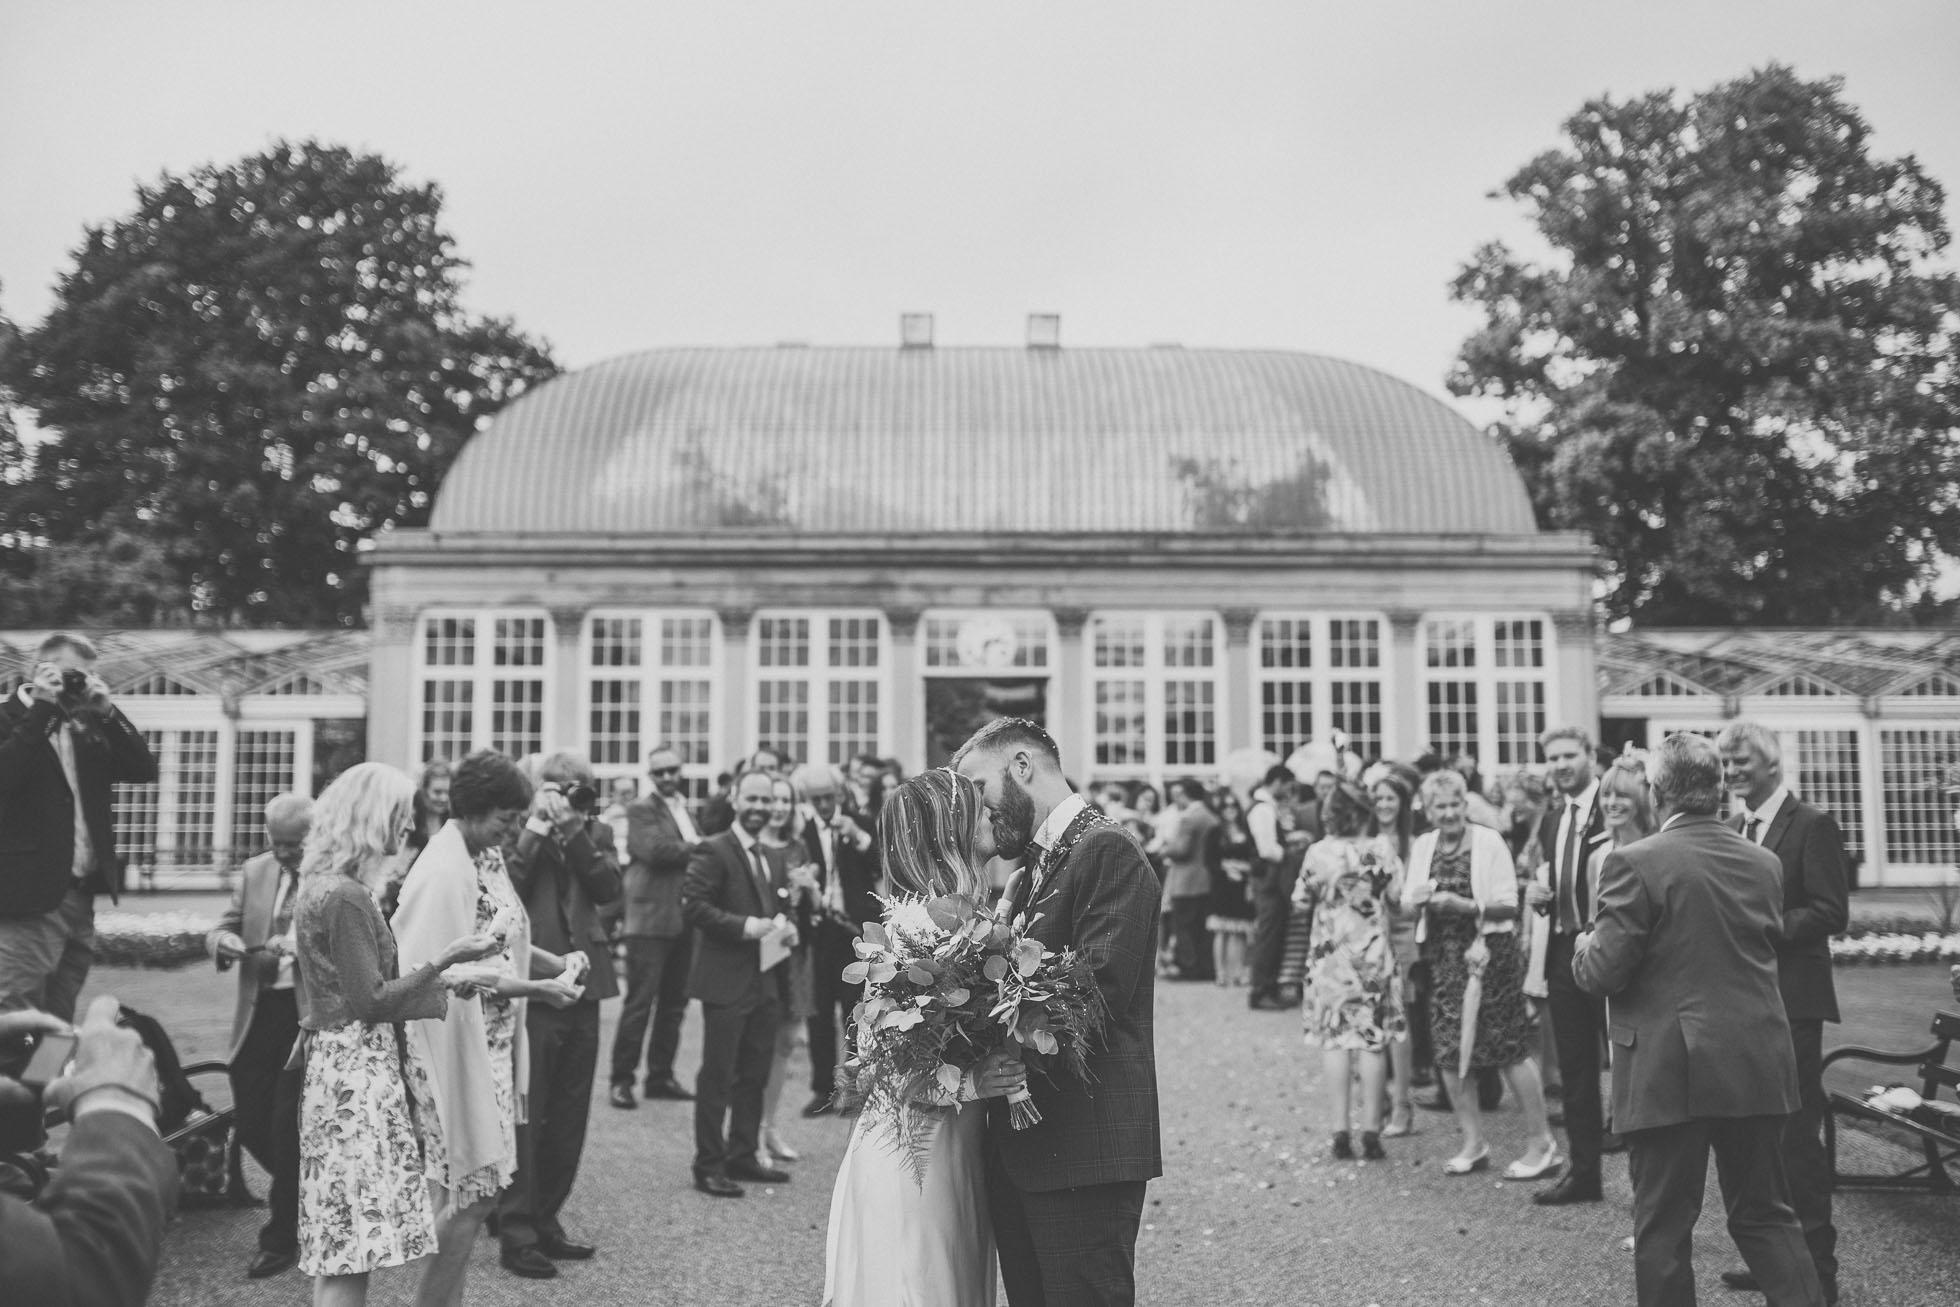 sheffield-botanical-gardens-wedding-photographer-29.jpg